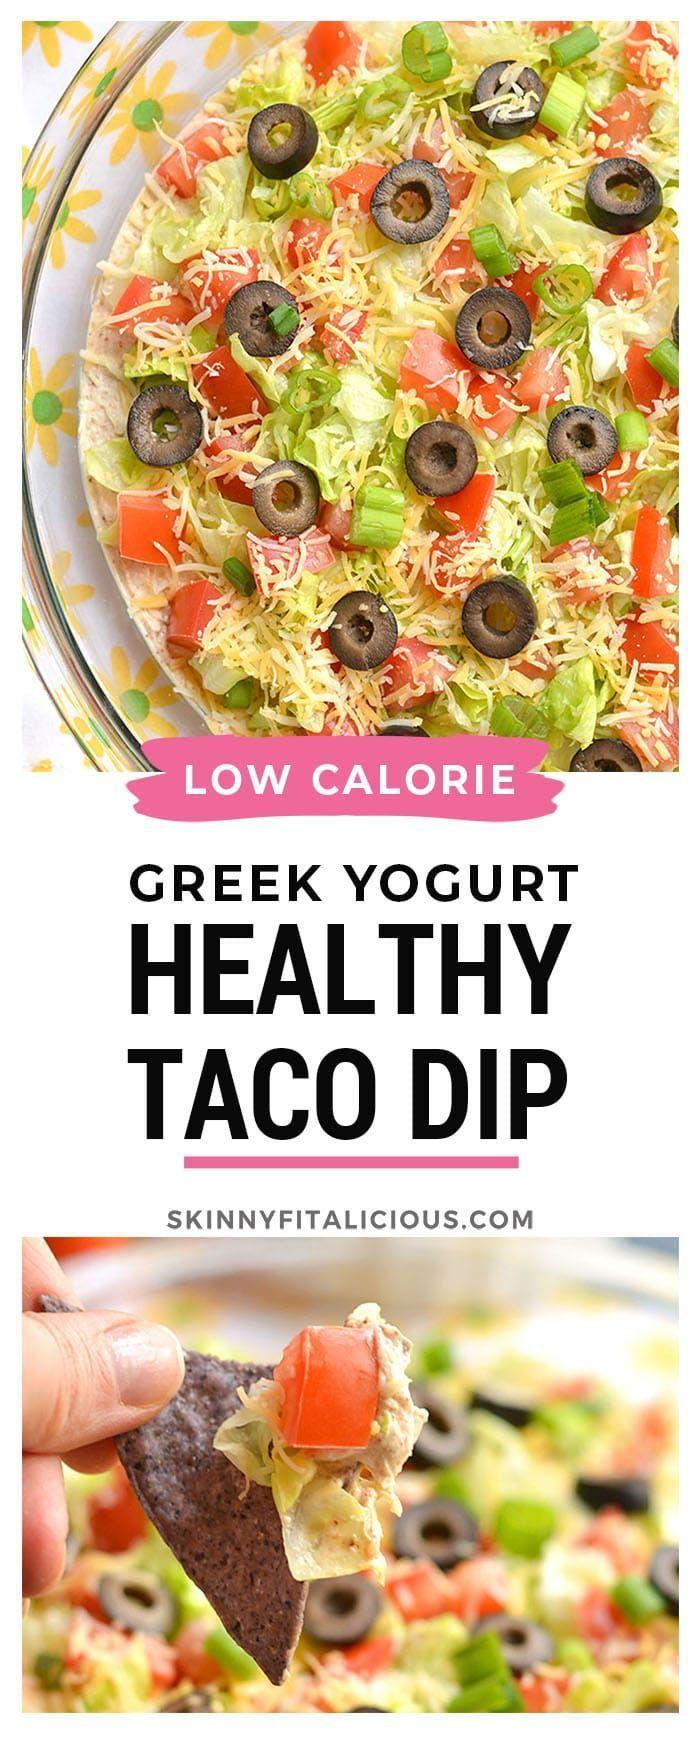 Healthy Greek Yogurt Taco Dip made gluten free with homemade taco seasoning rezepte calorie dinner calorie food calorie recipes